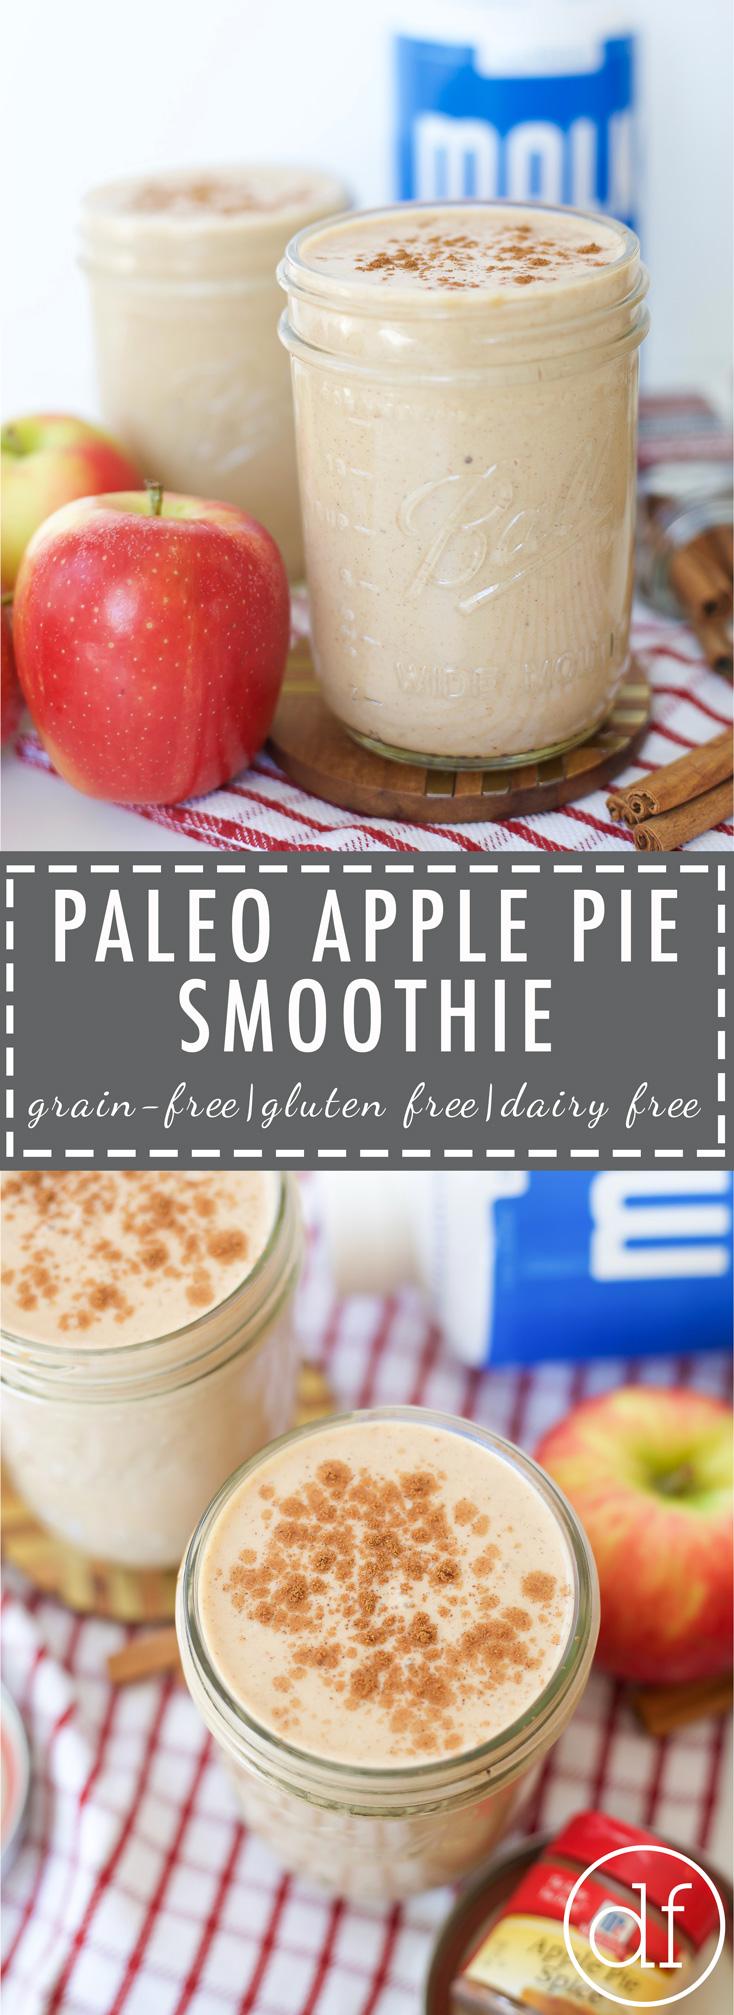 Define Fetttle, Apple Pie Smoothie, Apple Pie, Paleo, Gluten Free, Grain Free, Dairy Free, Primal, Whole30, Paleo Recipes, Real Food, Malk Organics